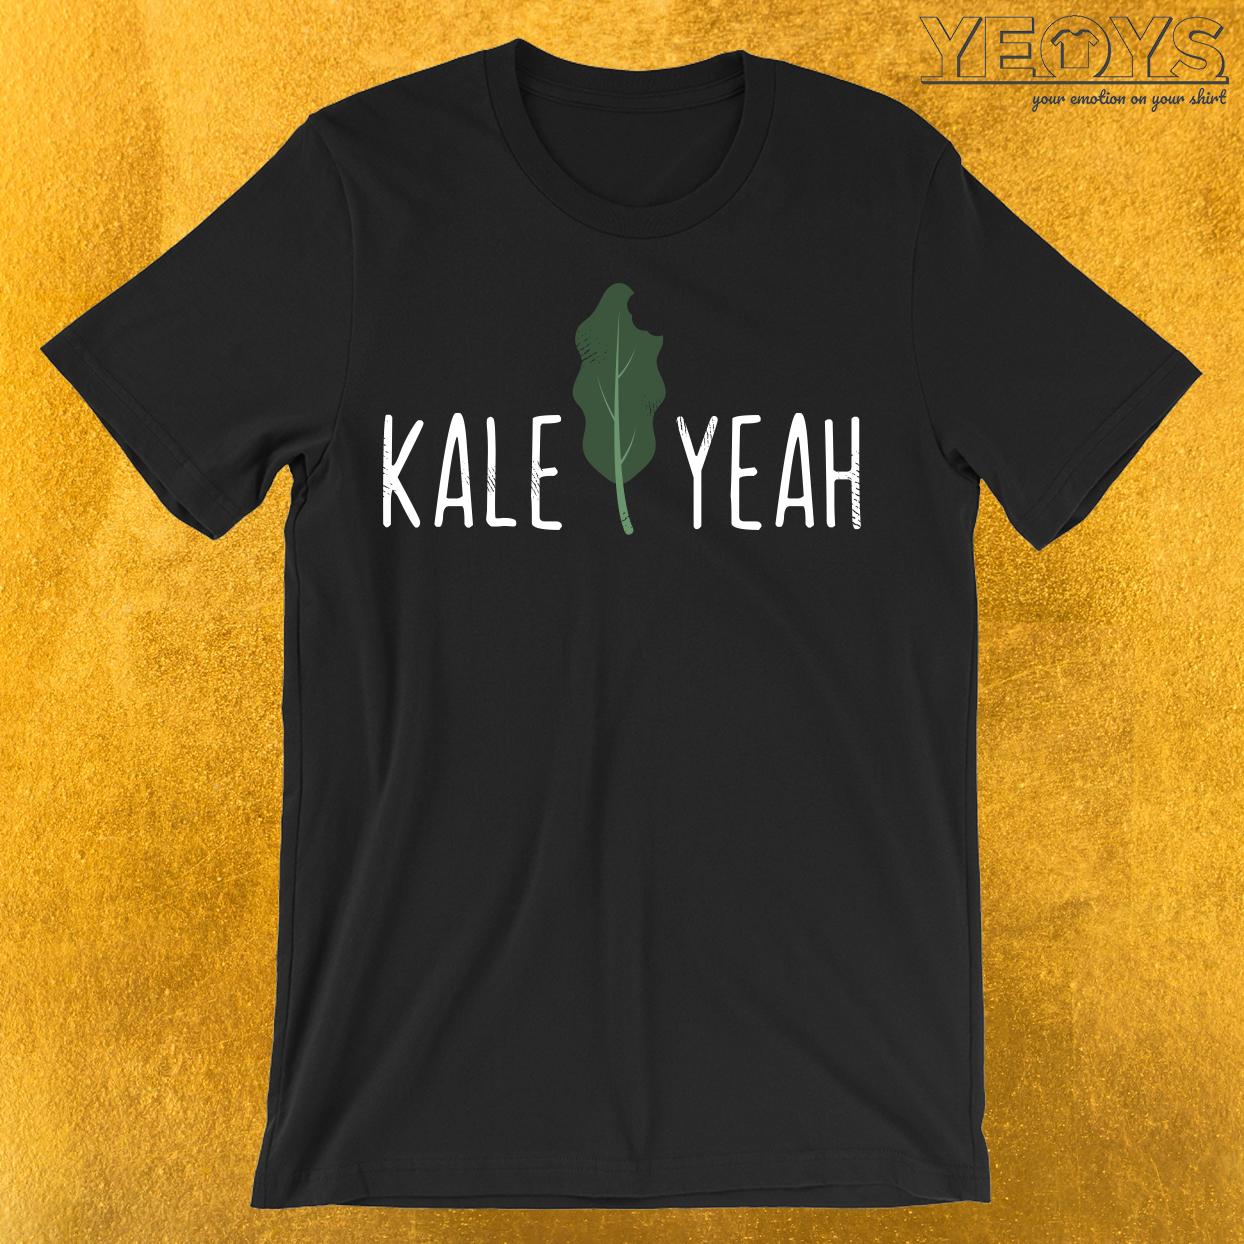 Kale Yeah Funny Vegan Pun T-Shirt